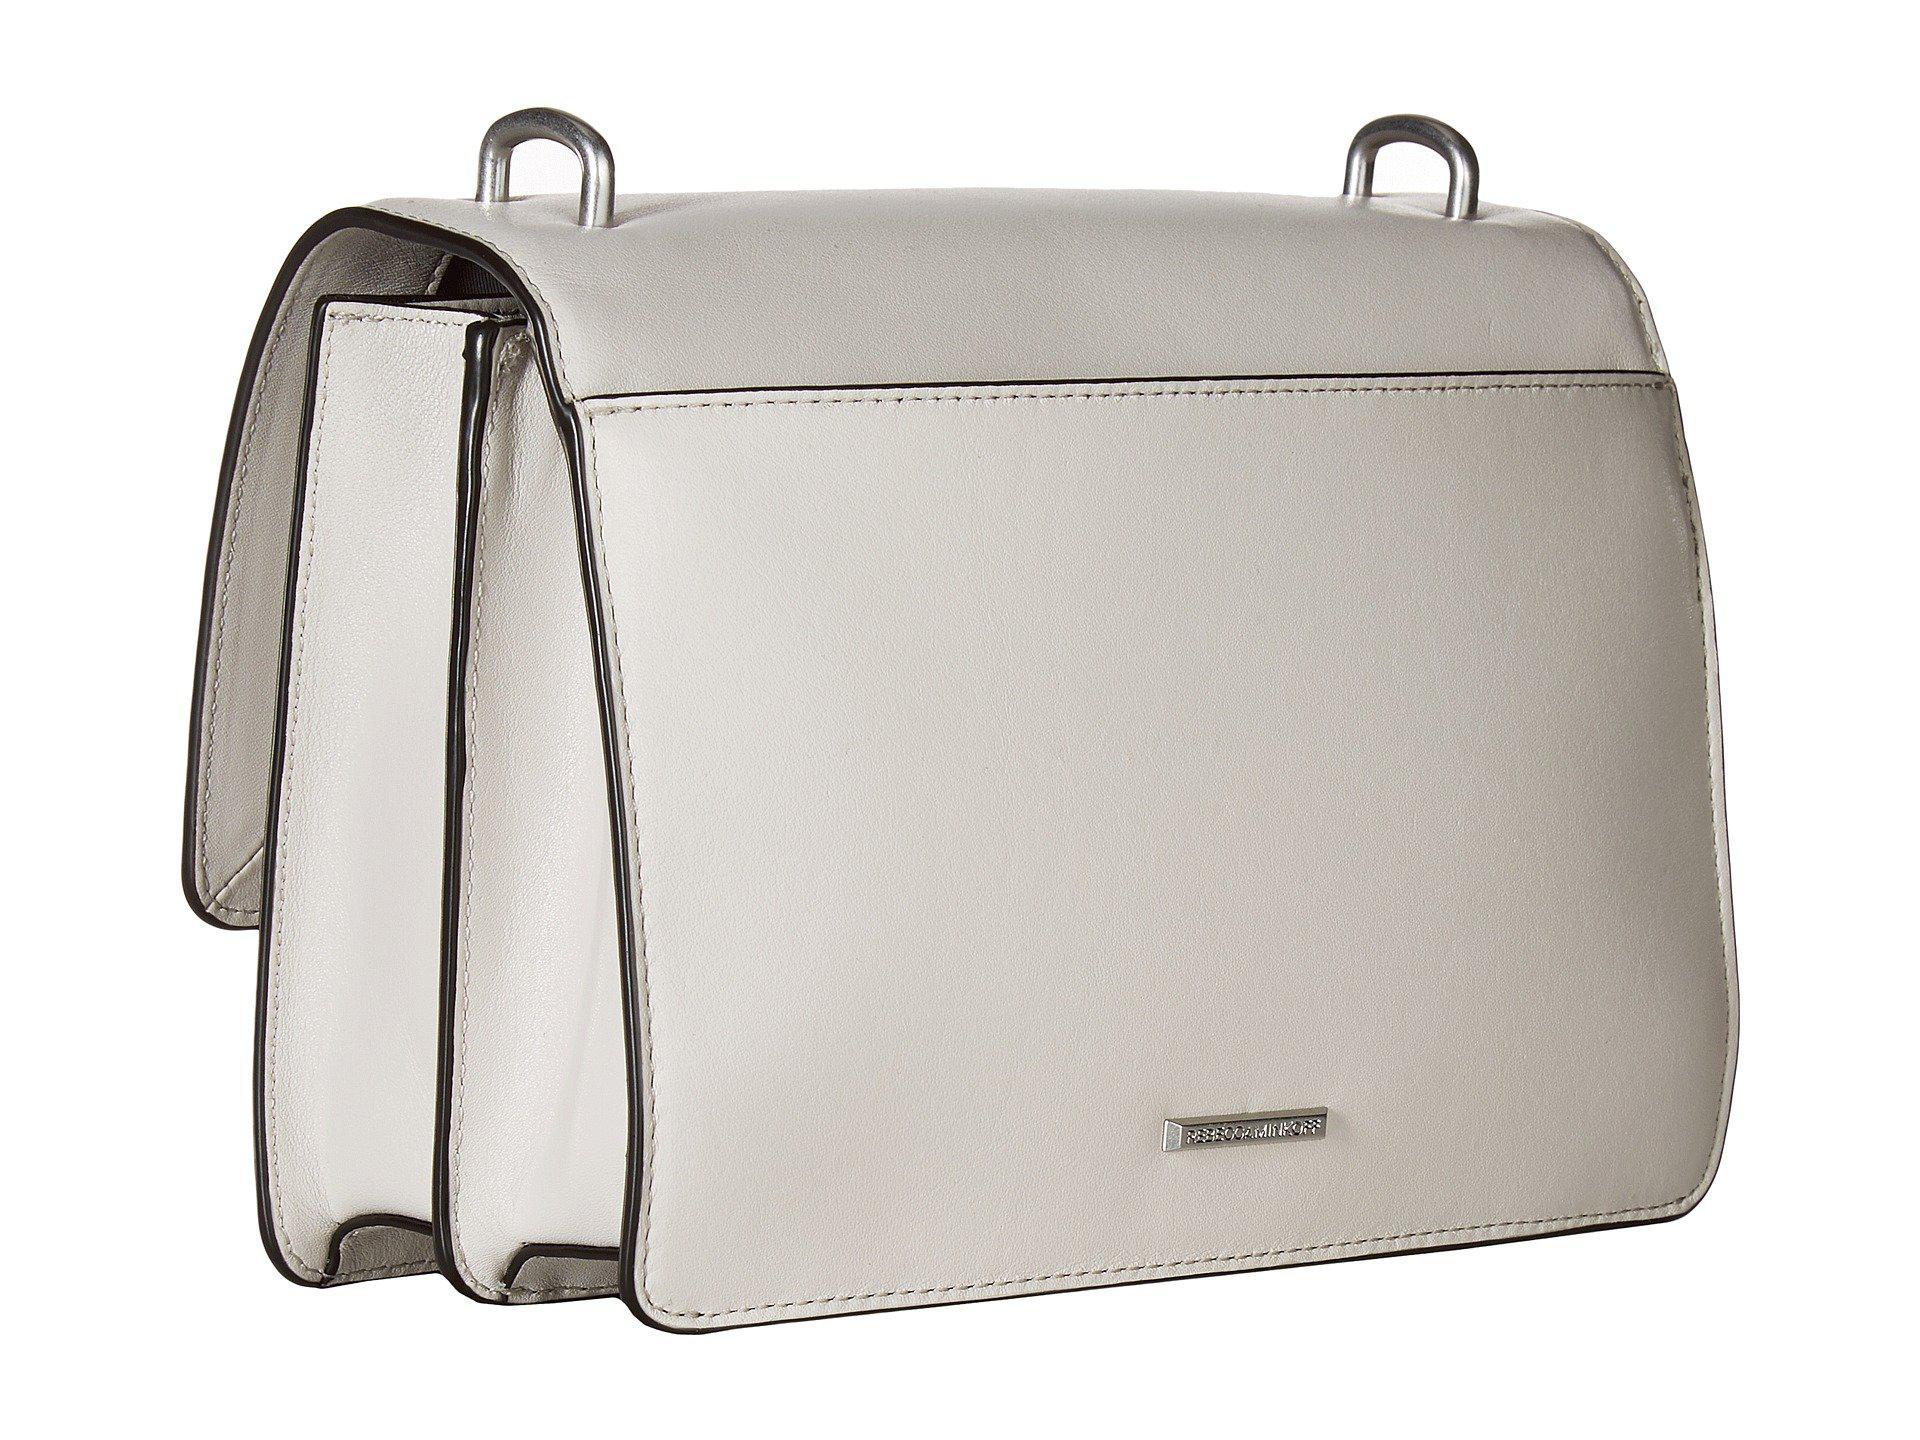 b6786ab3f27a4 Rebecca Minkoff - Multicolor Christy Medium Shoulder Bag (putty) Handbags -  Lyst. View fullscreen